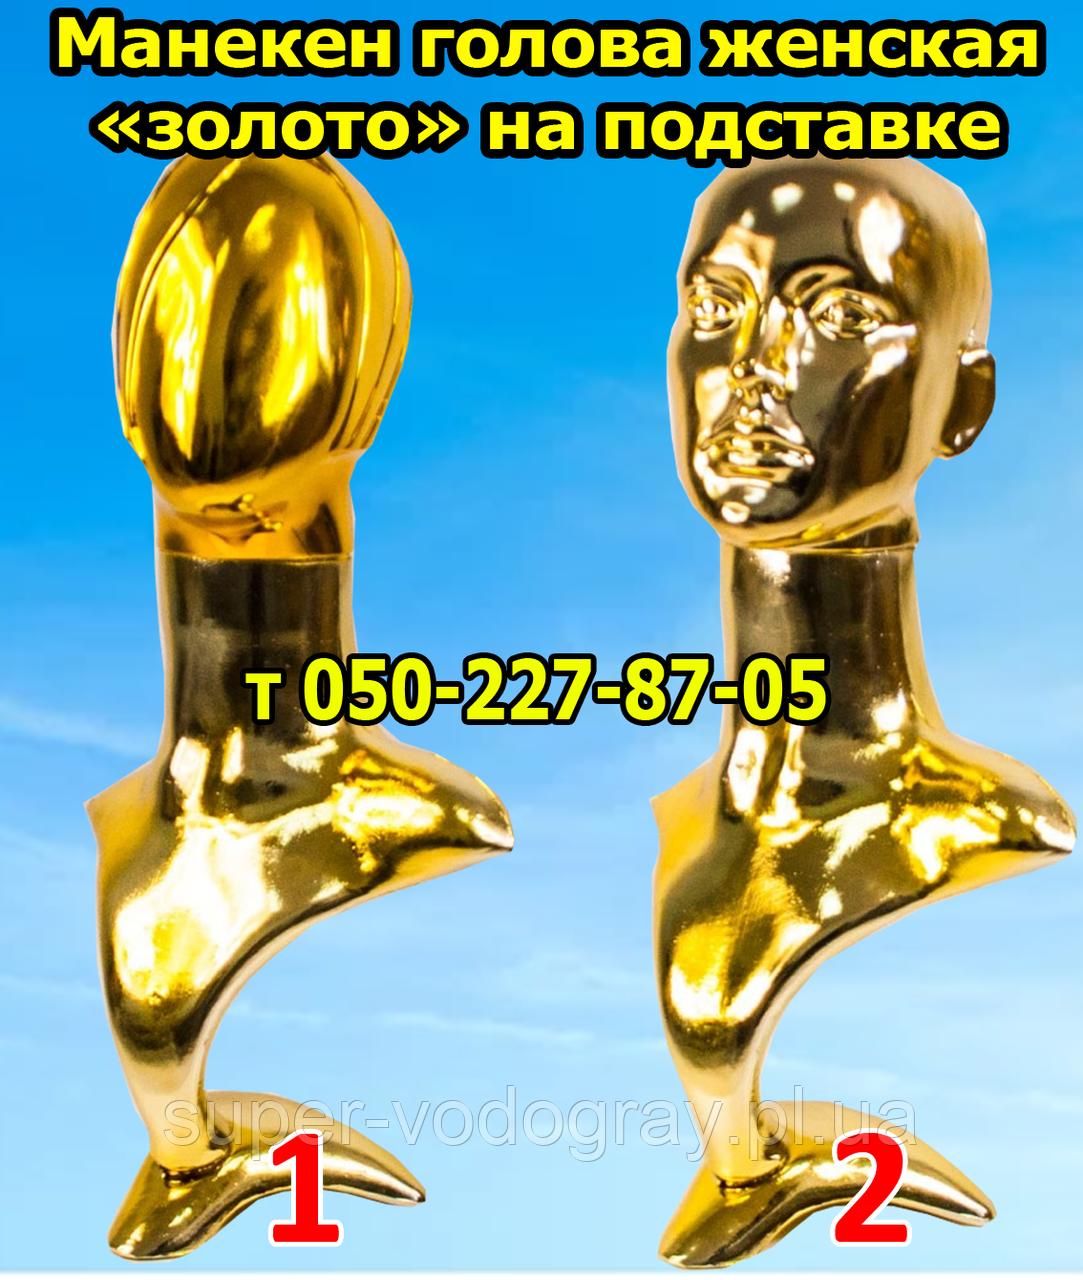 "Манекен голова женская ""золото"" (на подставке)"